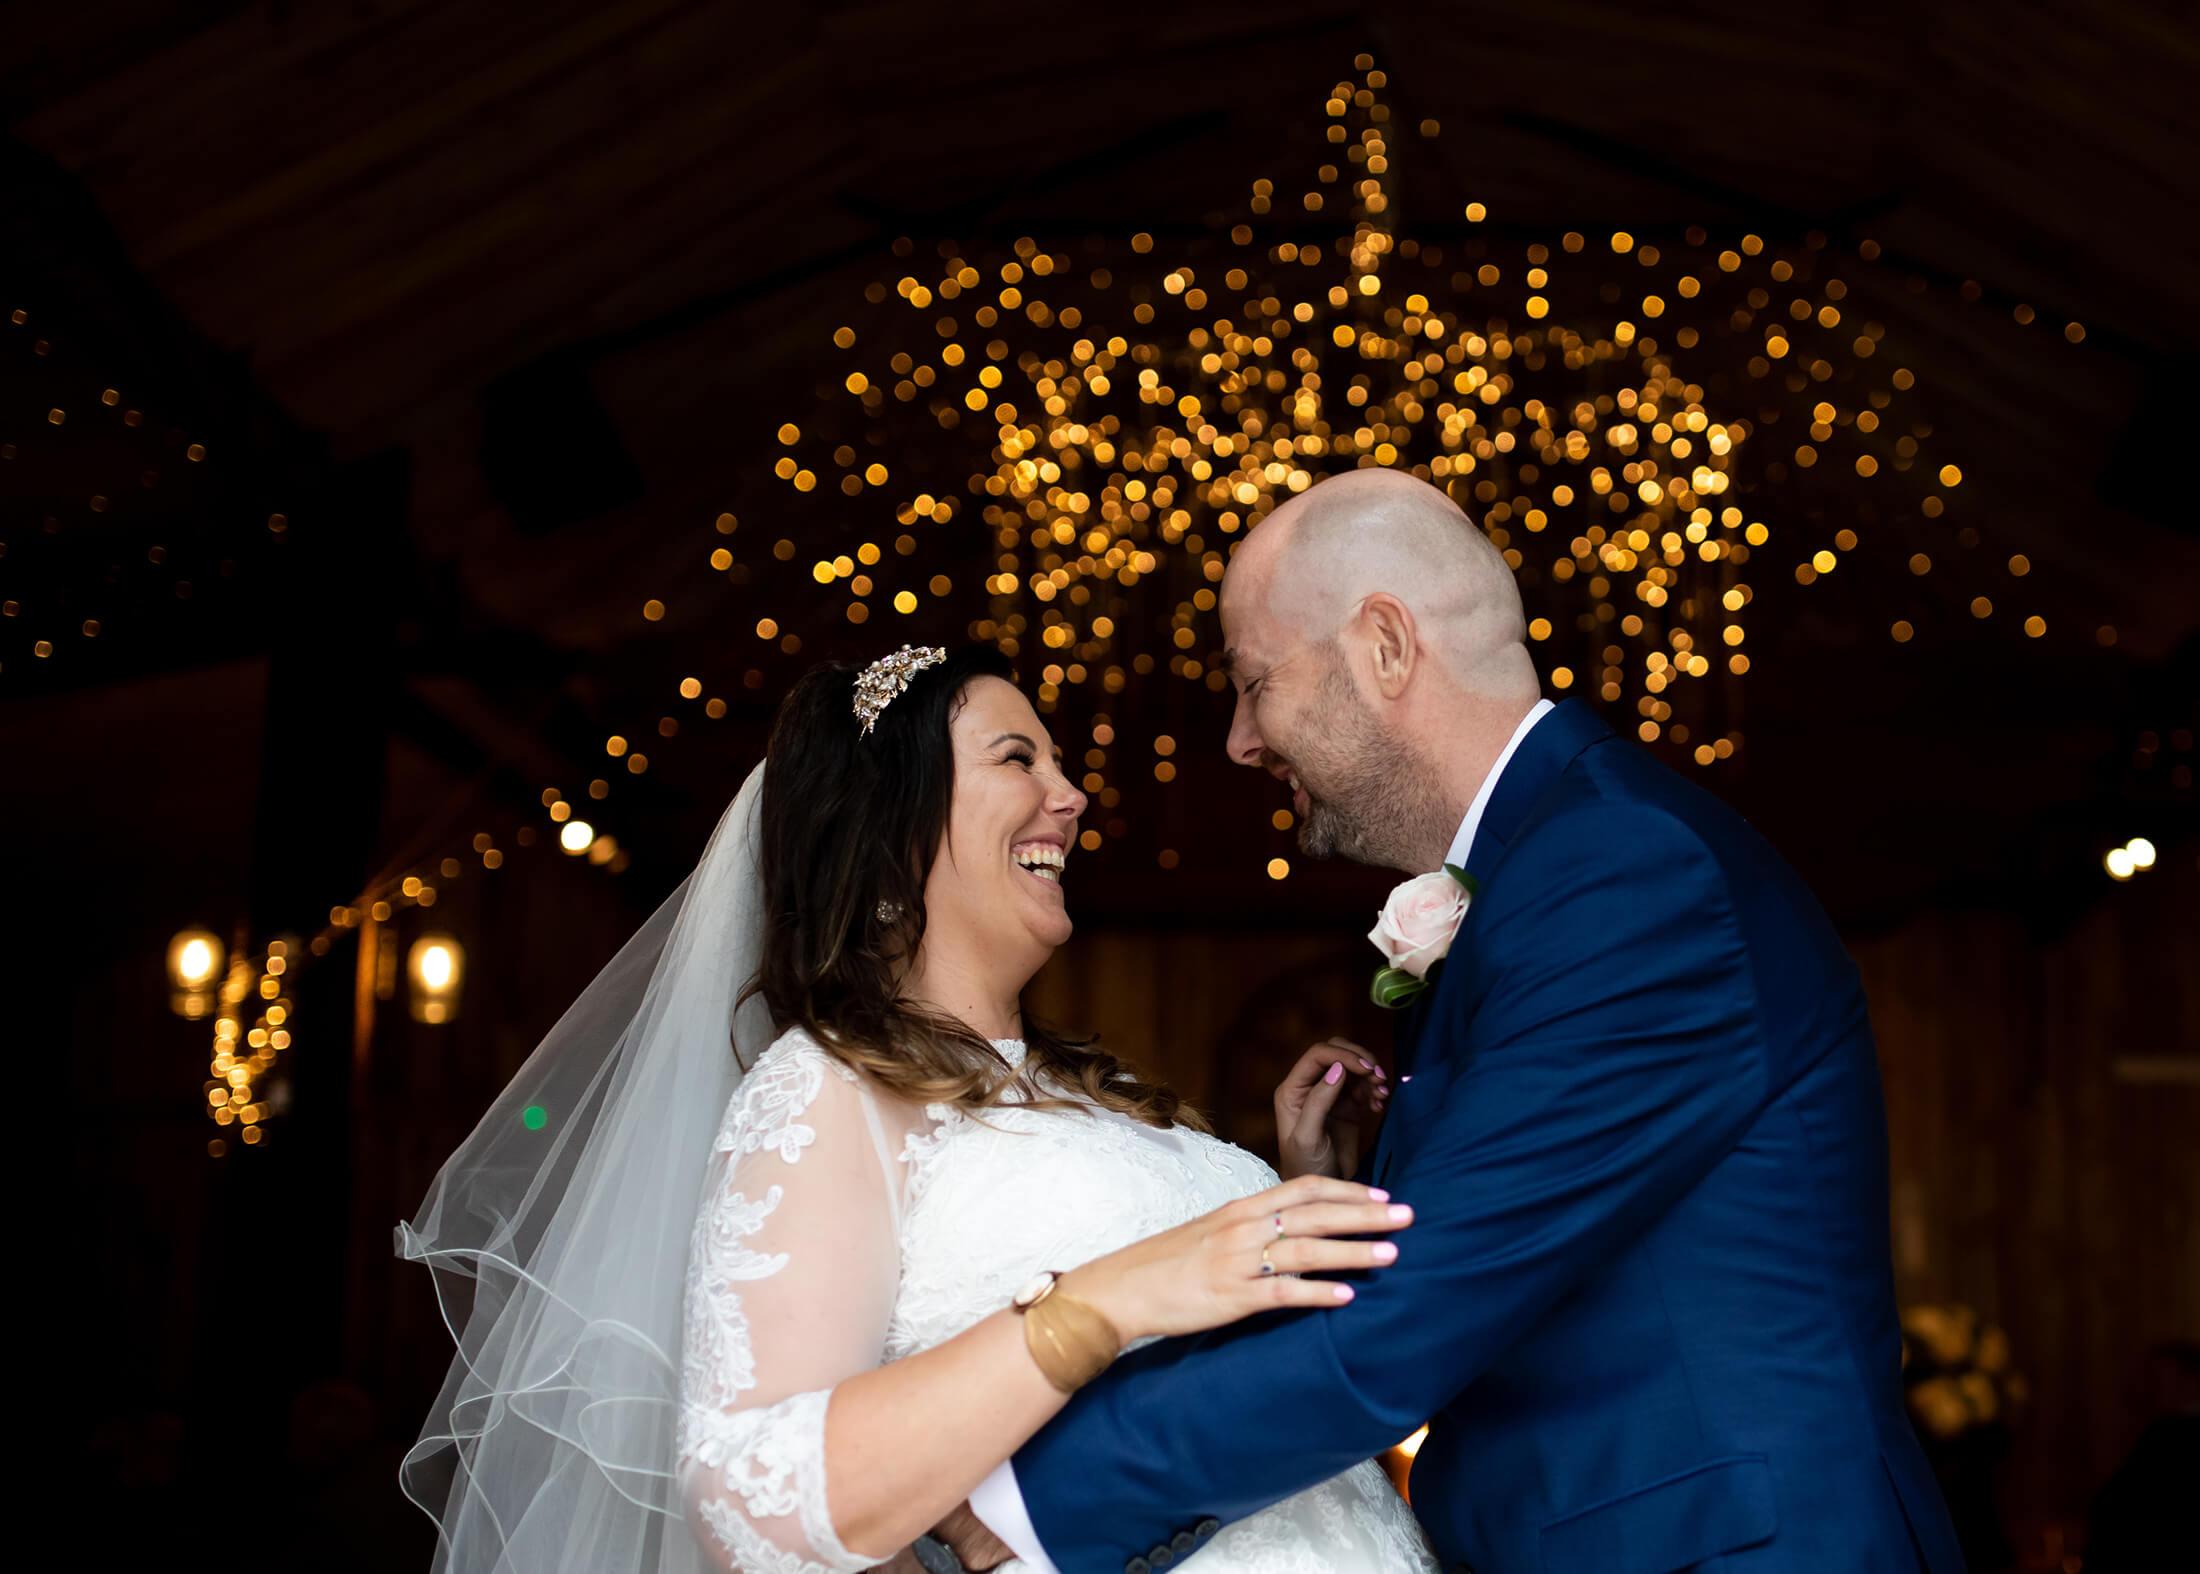 Alcumlow Hall Farm Wedding Photographer – Richard & Emma